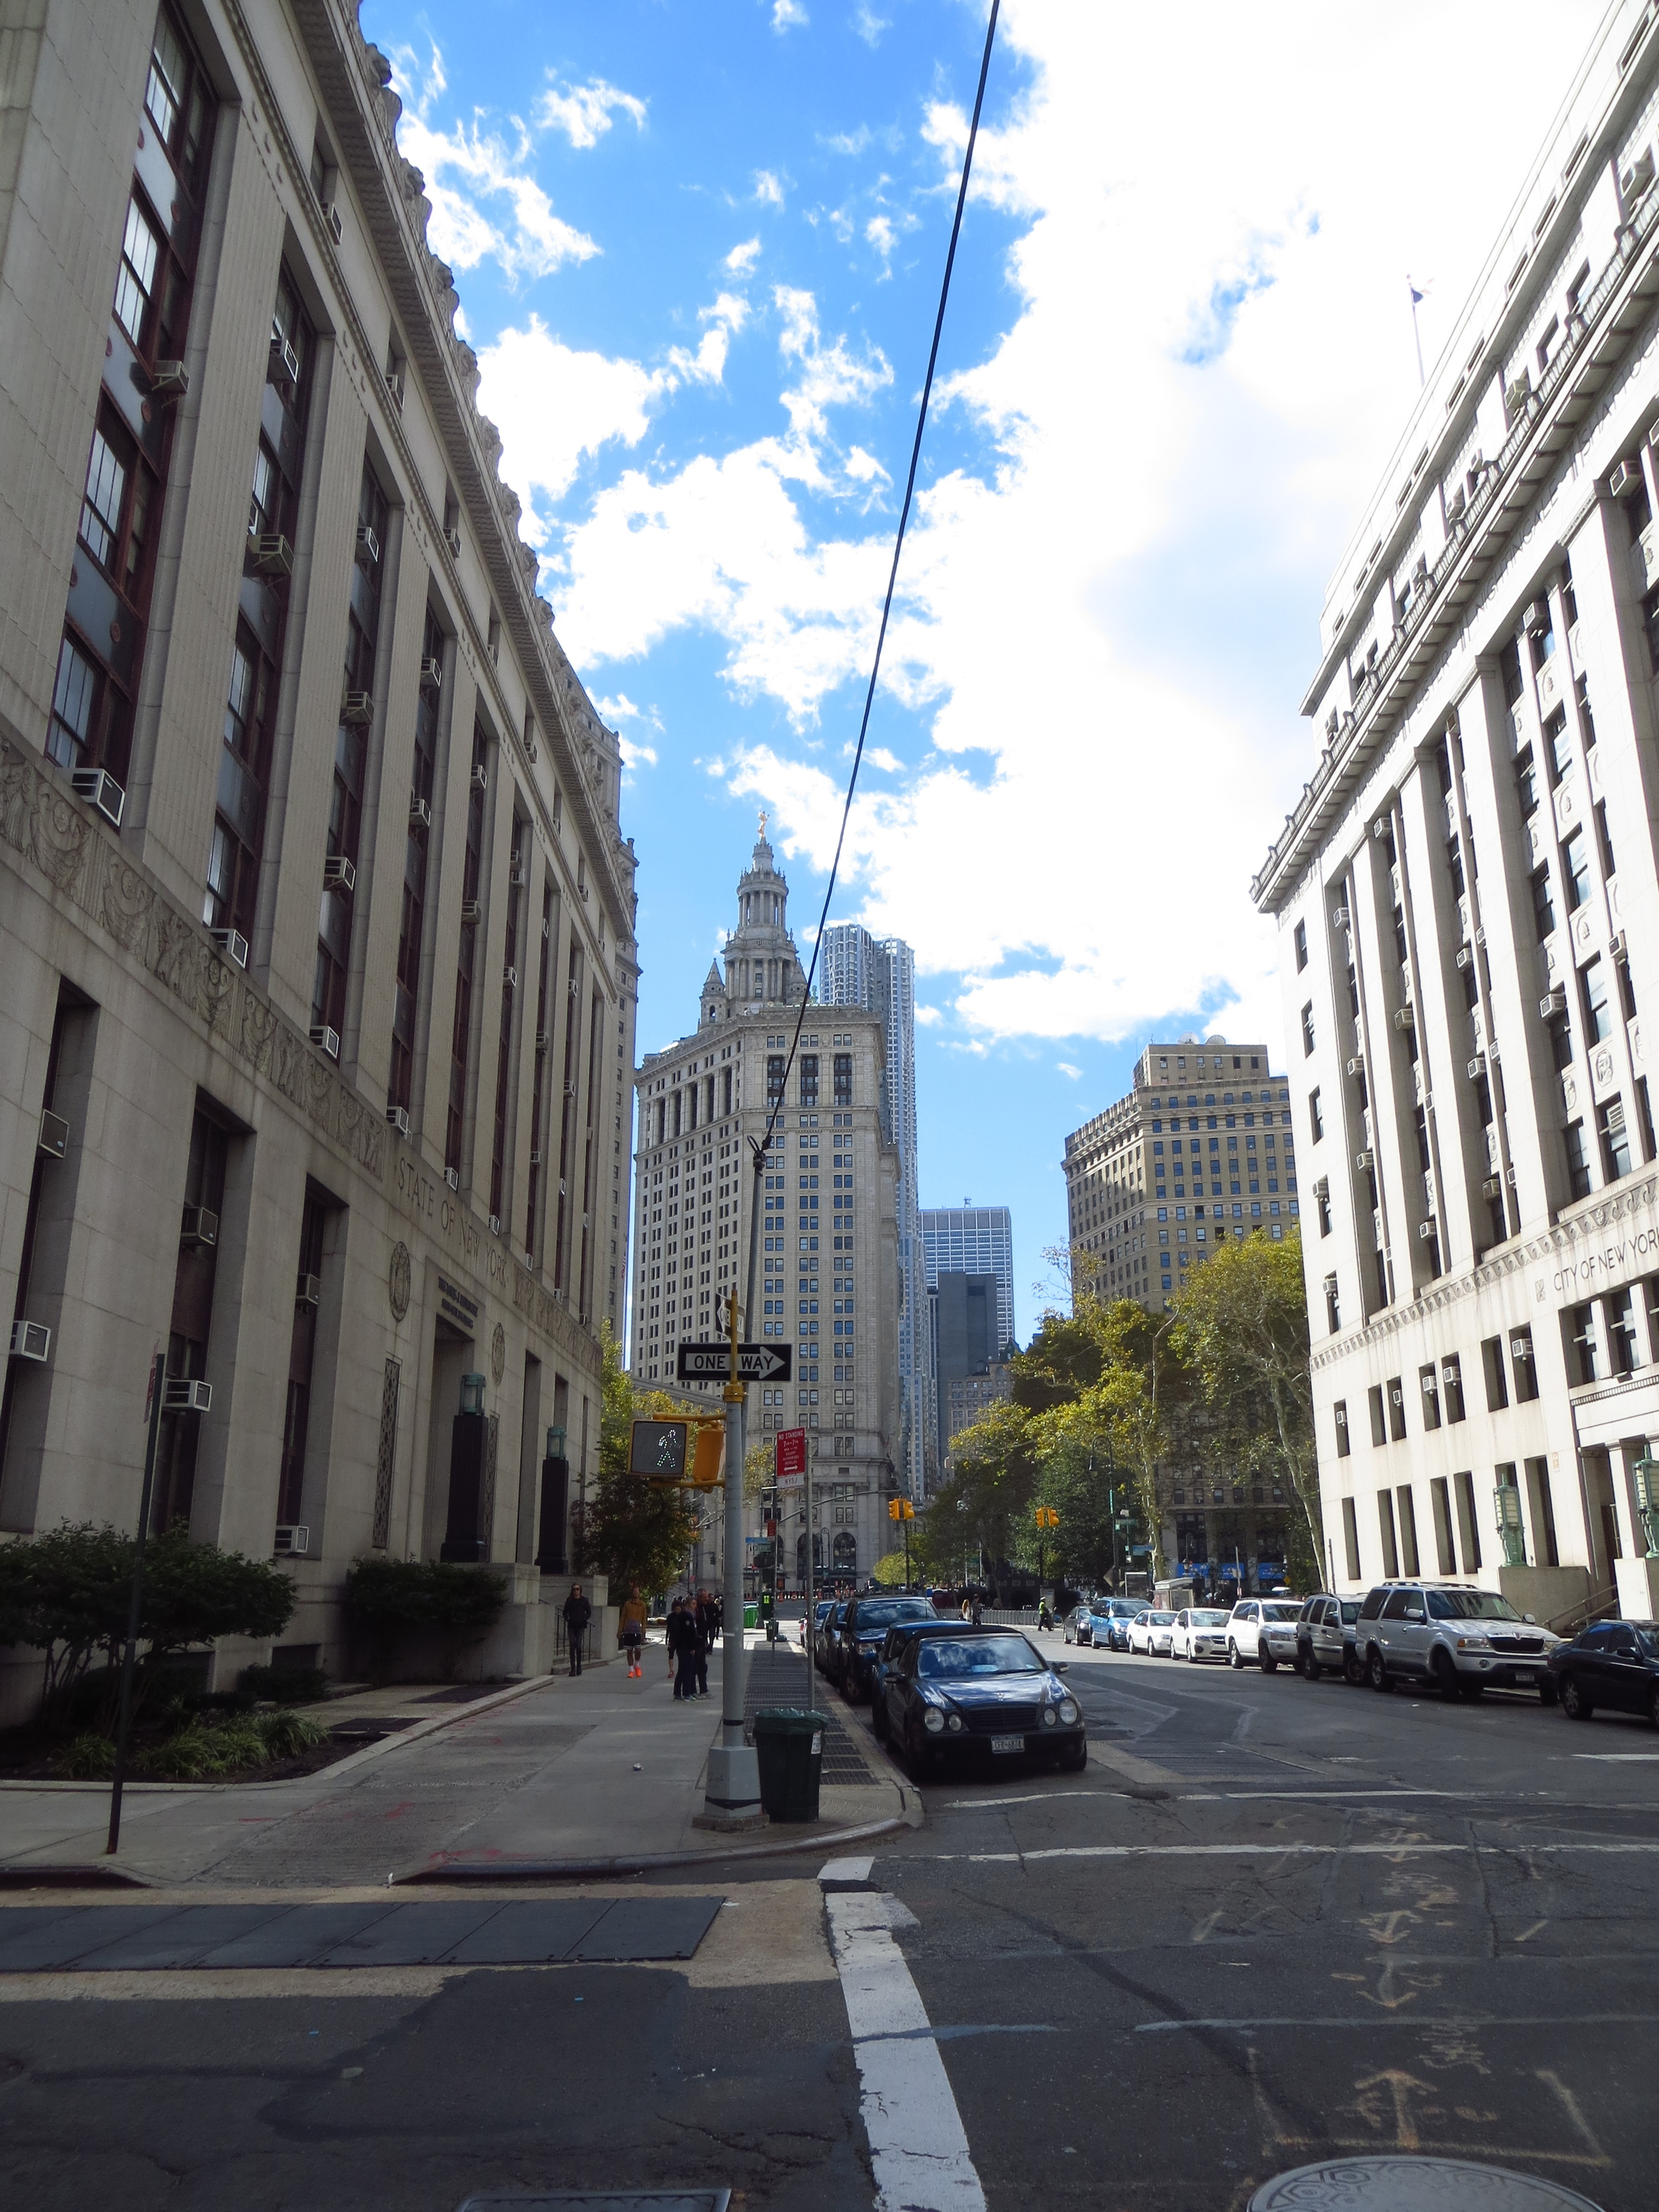 More Civic Center buildings